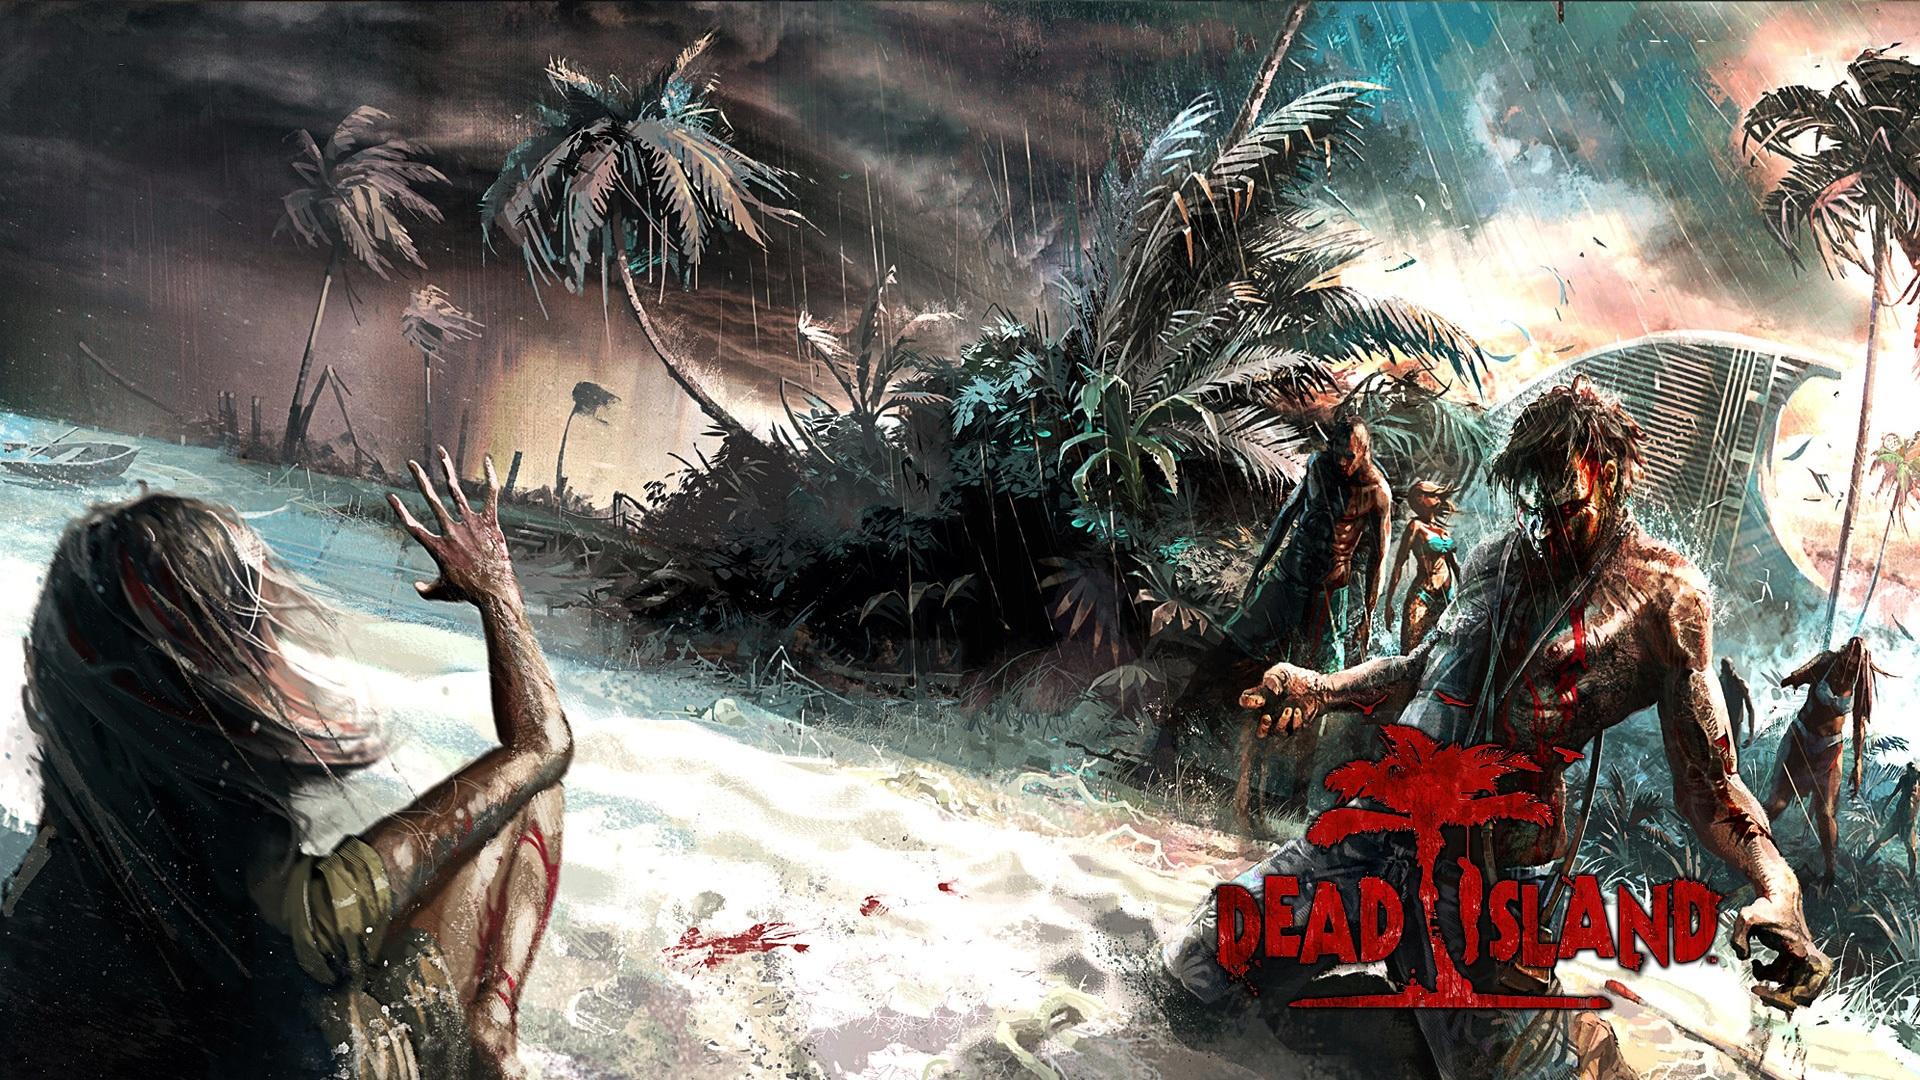 Dead Island HD 1920x1080 Wallpaper, Games Wallpapers, HD, Widescreen ...